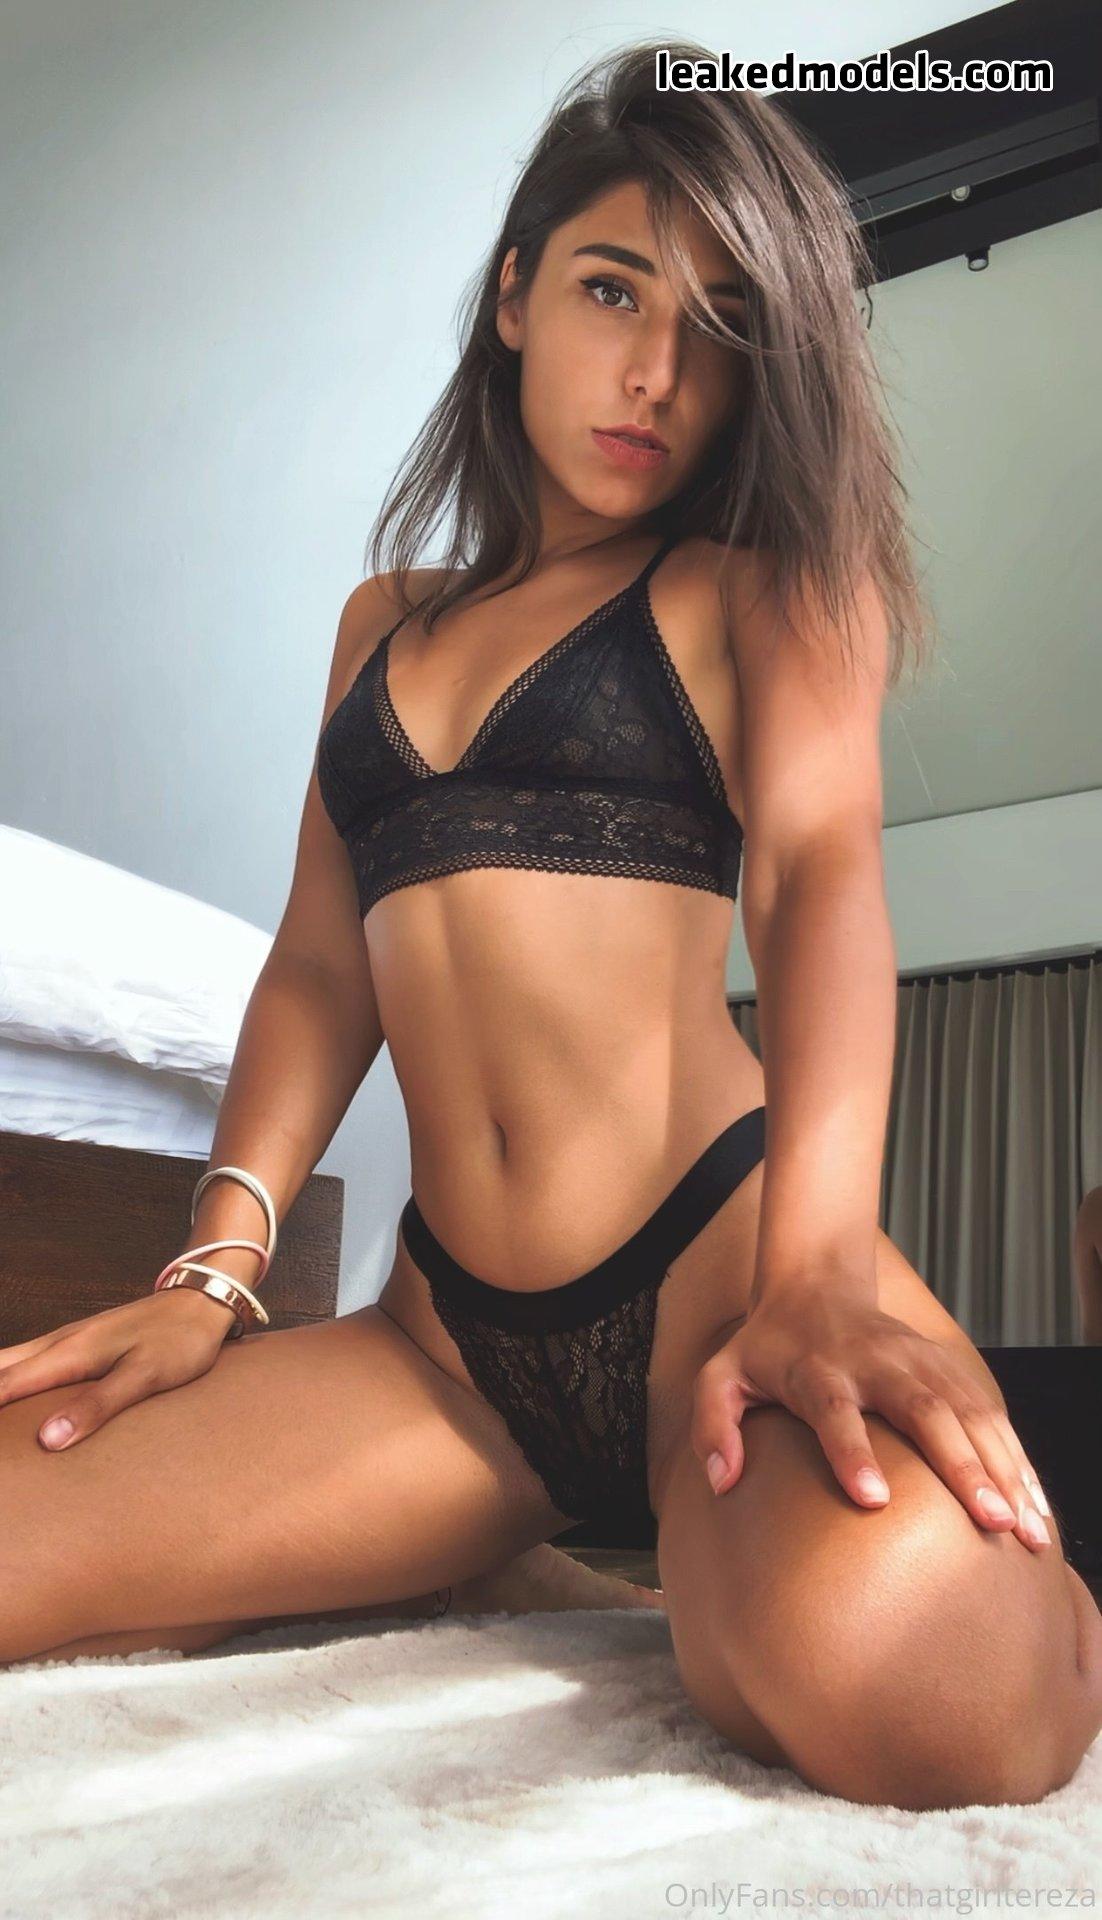 Tereza – thatgirltereza OnlyFans Nude Leaks (25 Photos)